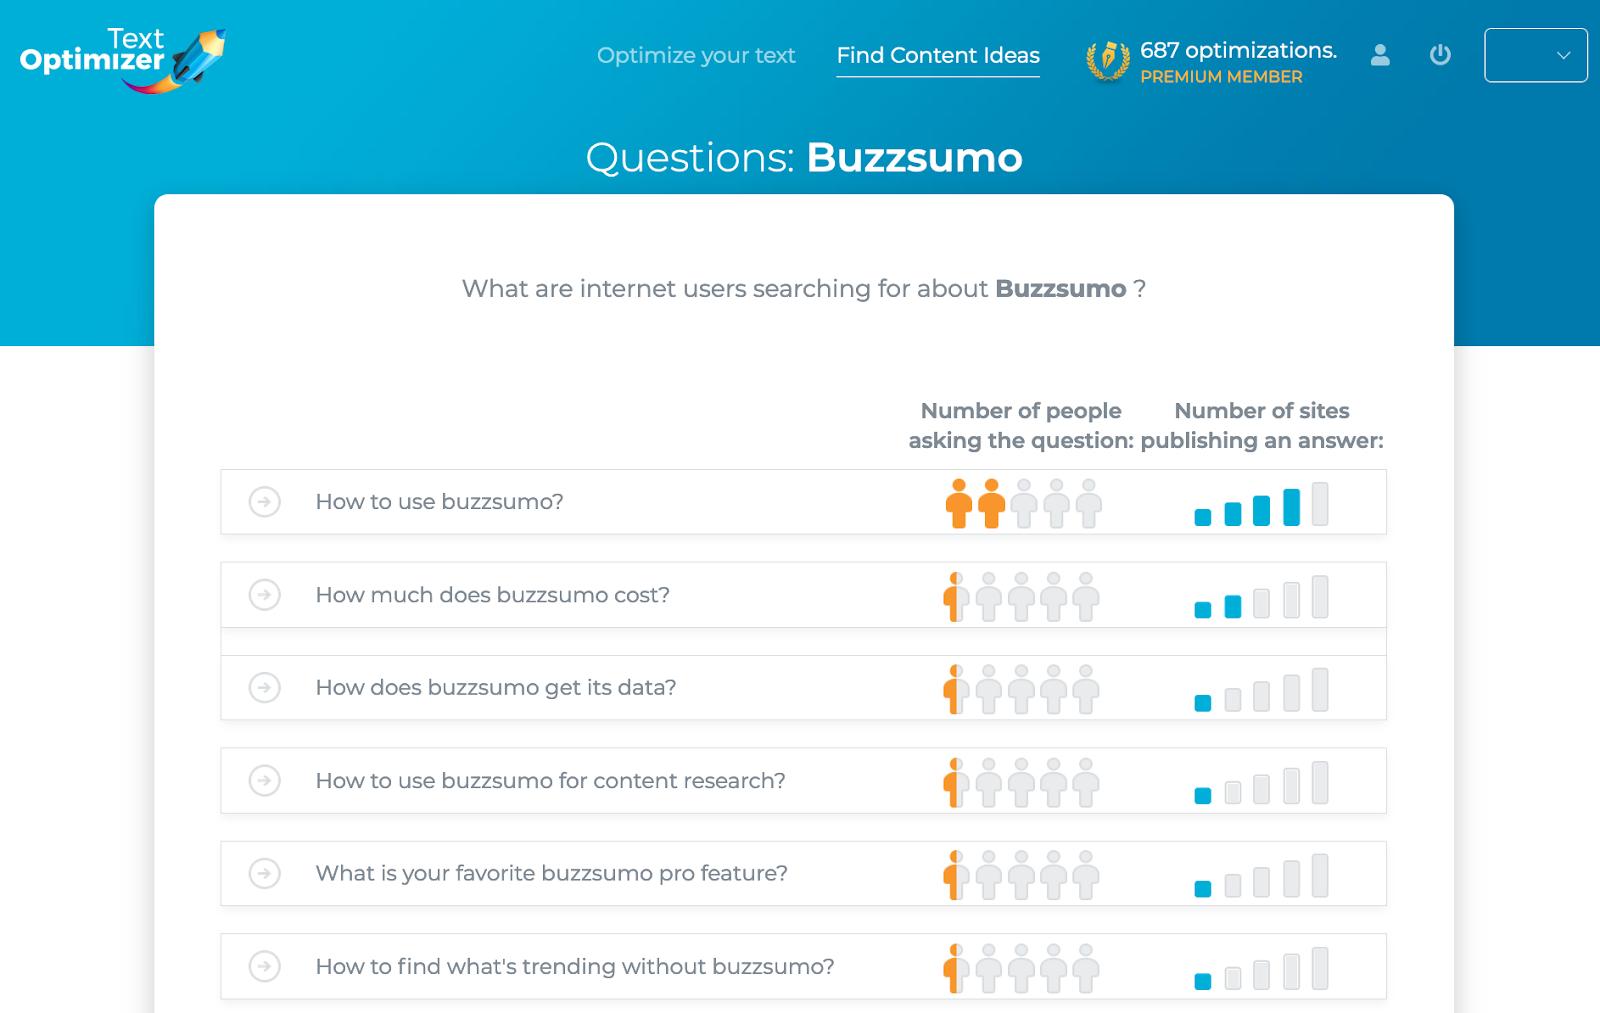 Снимок экрана поискового оптимизатора текста для Buzzsumo.